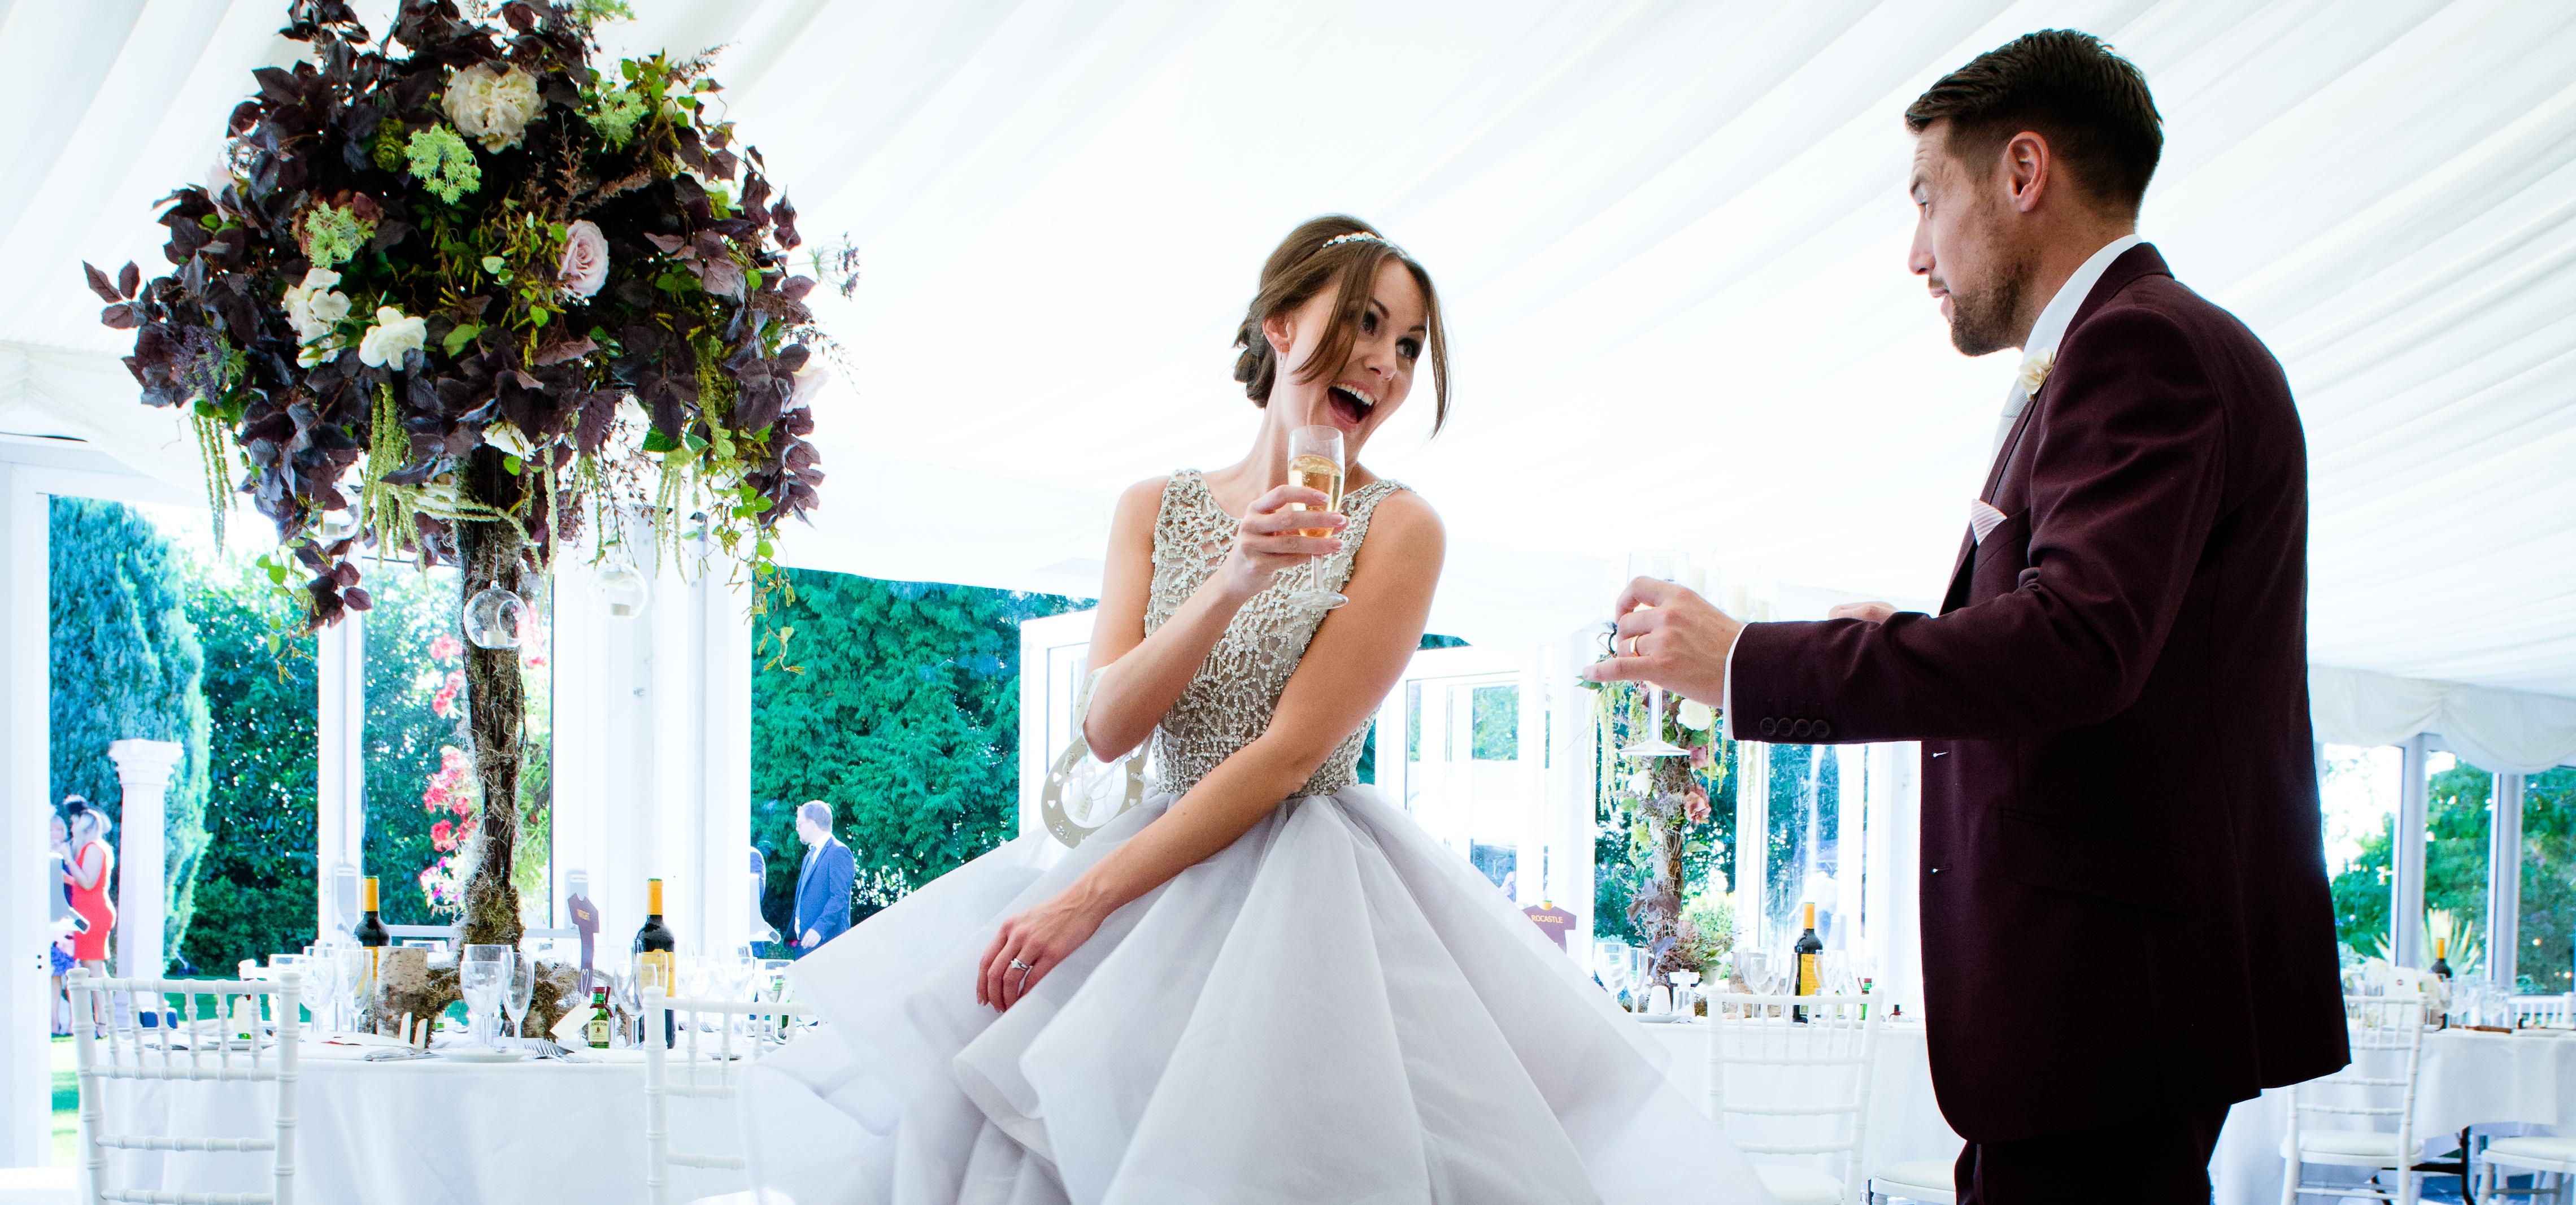 Alice & Elliot_Wedding_Paul Griffiths Photography-375